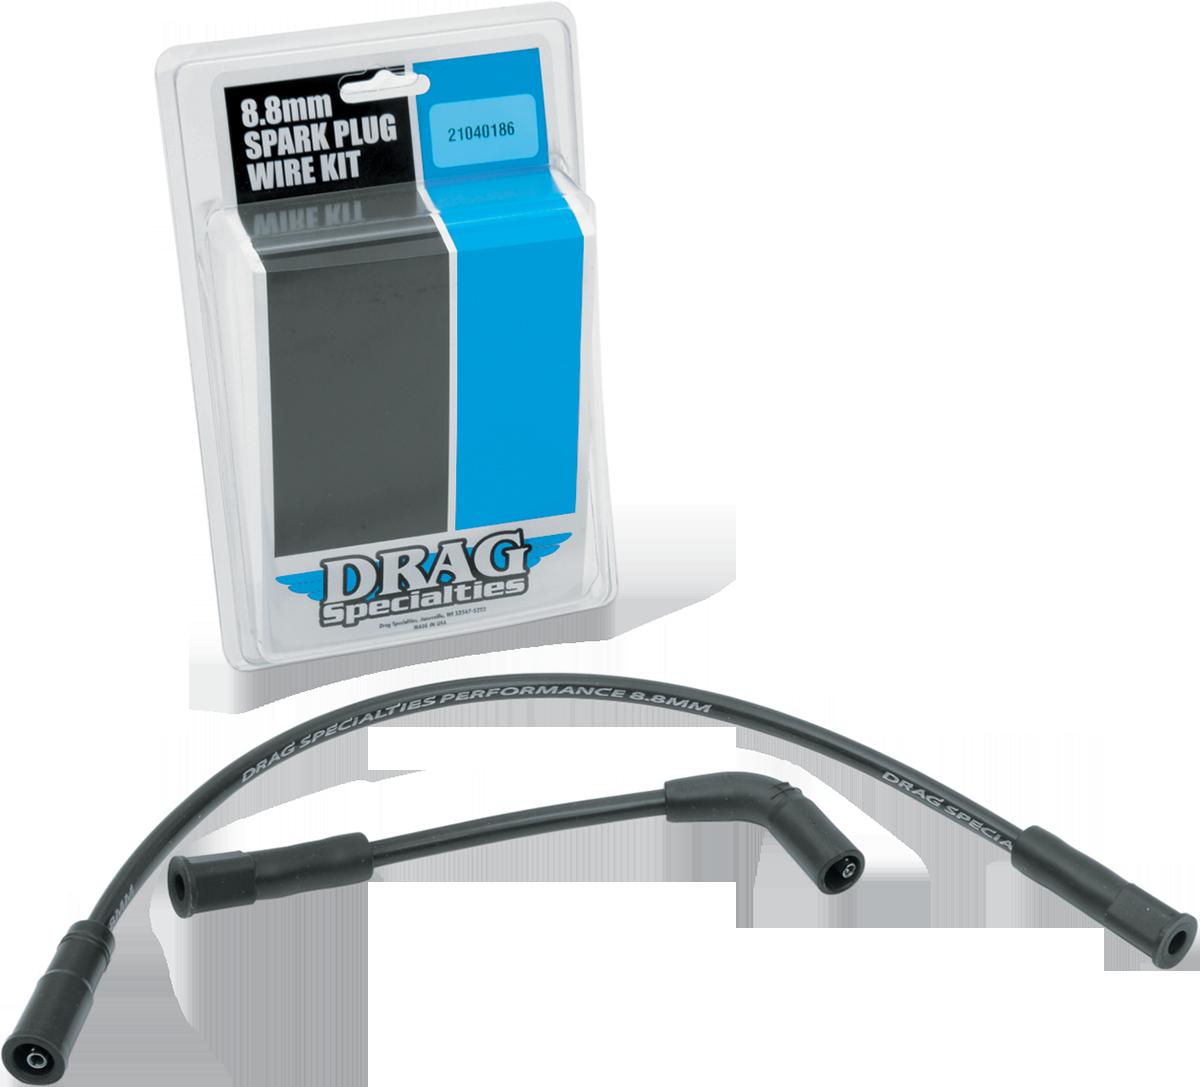 2104-0147 Drag Specialties 8.8mm Spark Plug Wire Set